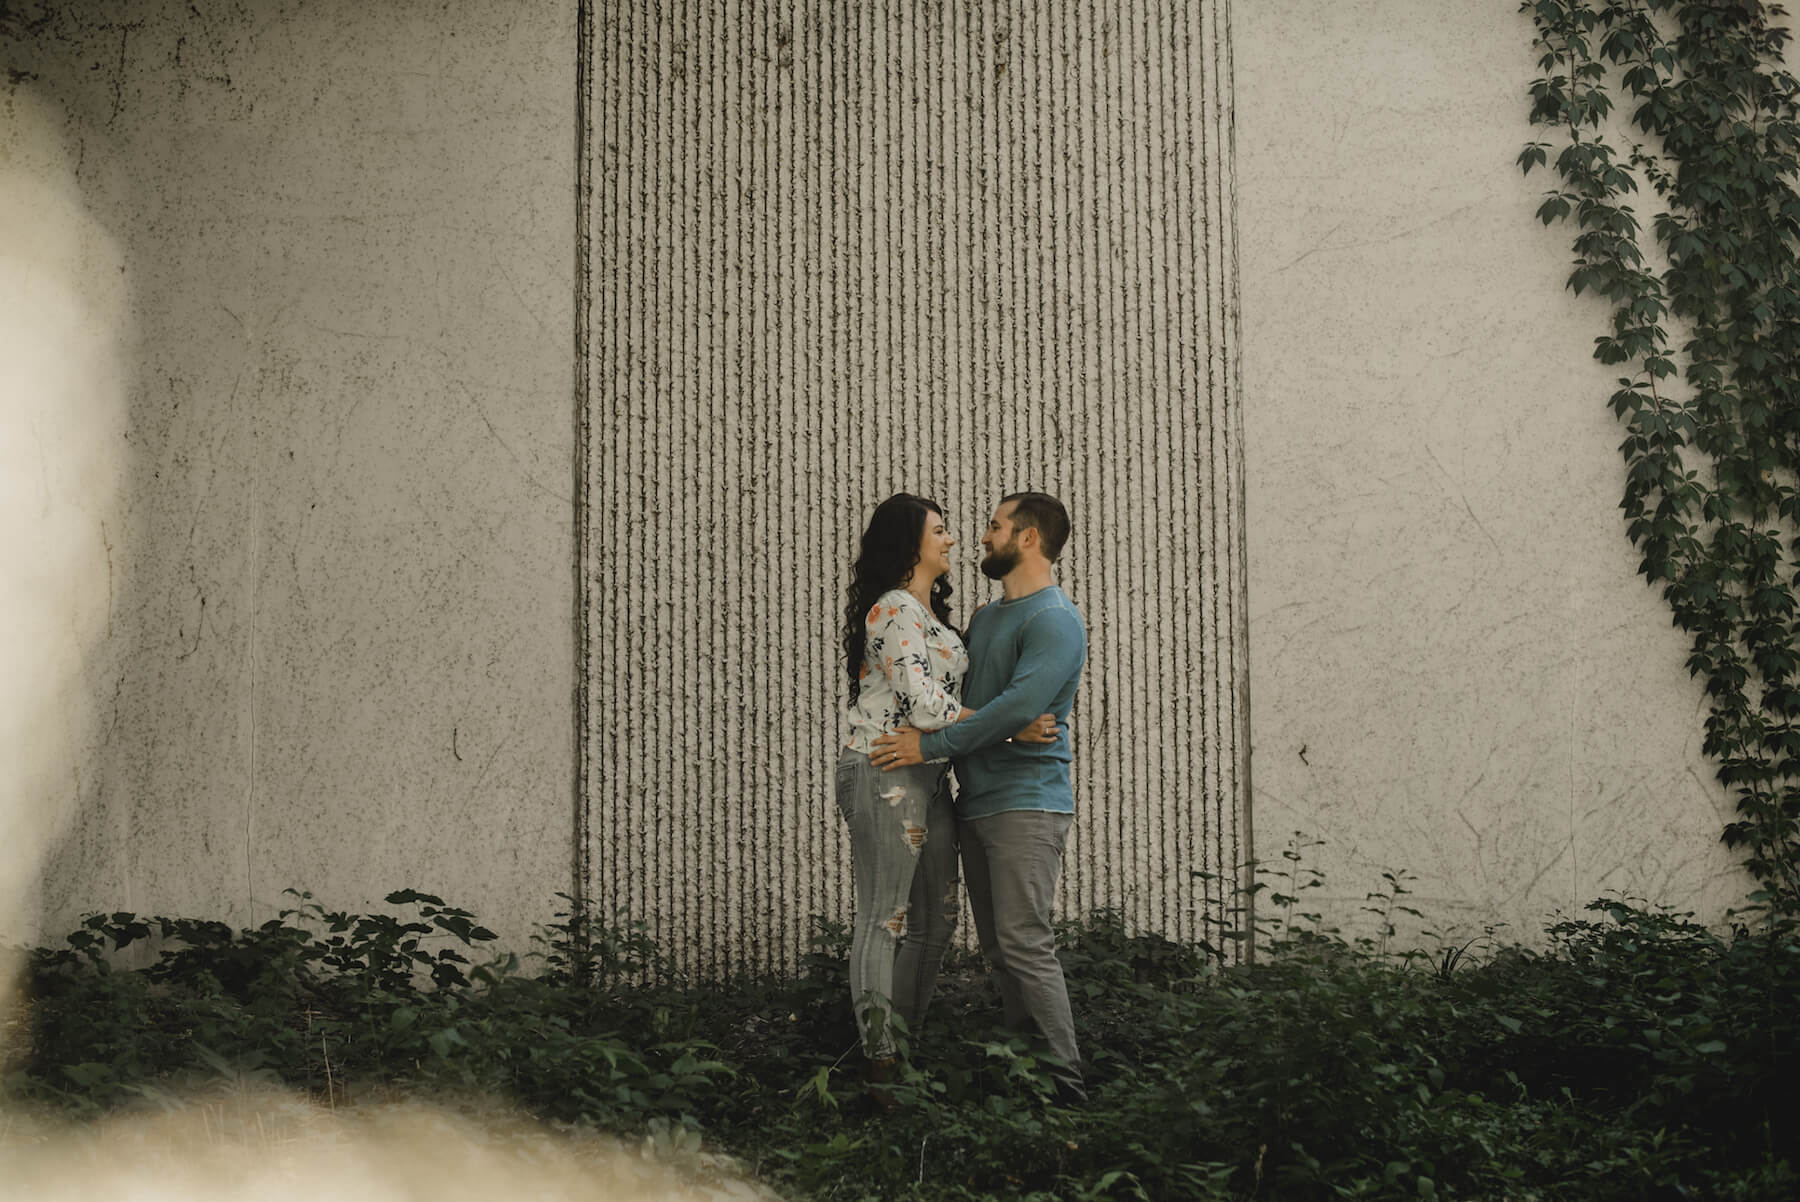 Engle-Olson-Chad-Jen-Engagement-3.jpg